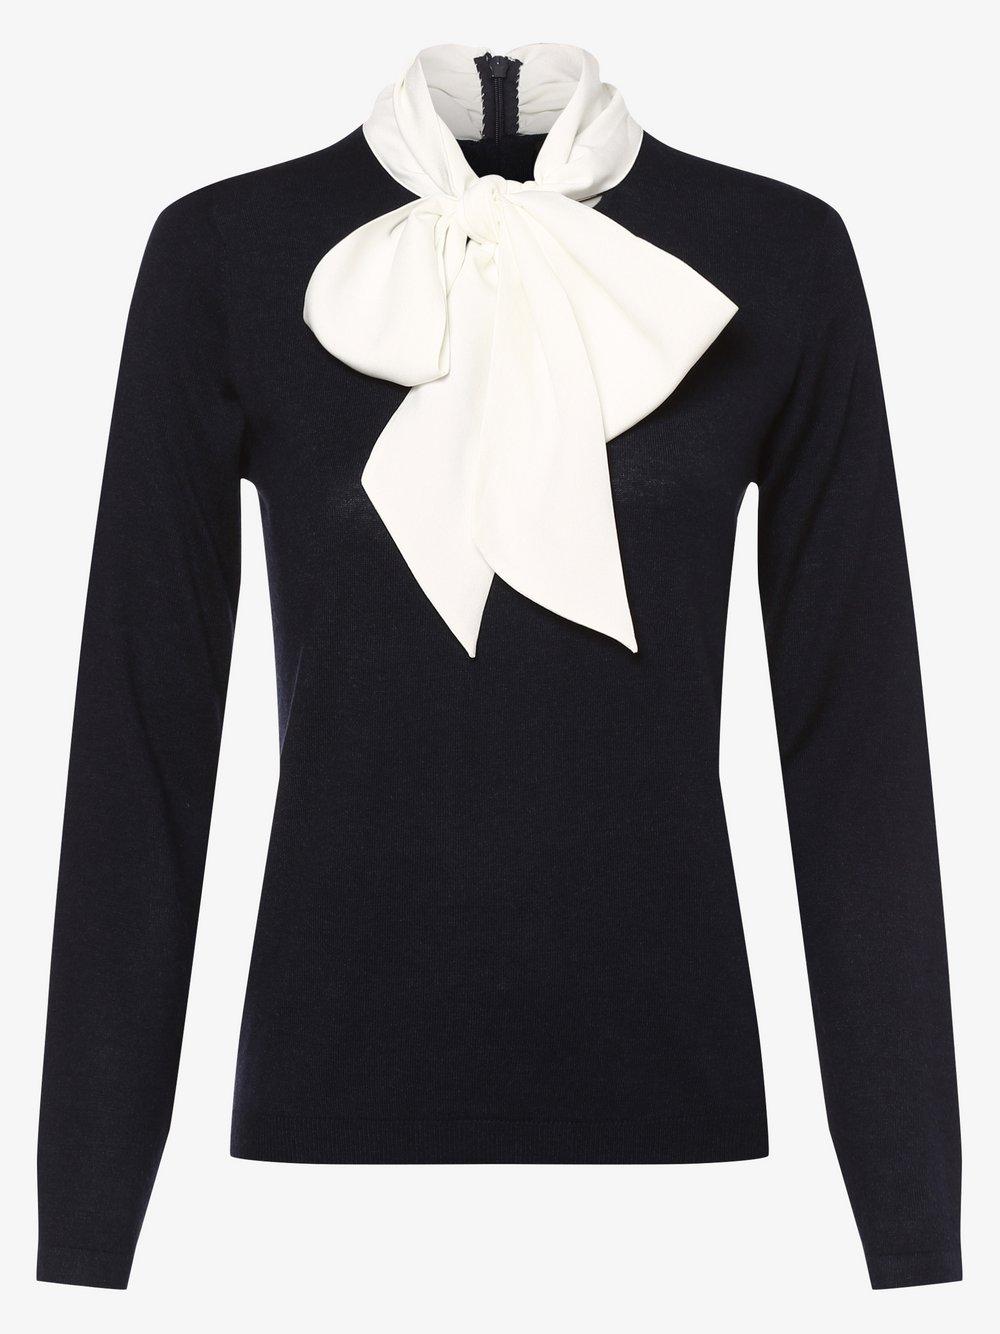 STEFFEN SCHRAUT – Sweter damski z dodatkiem kaszmiru, niebieski Van Graaf 479468-0001-00380